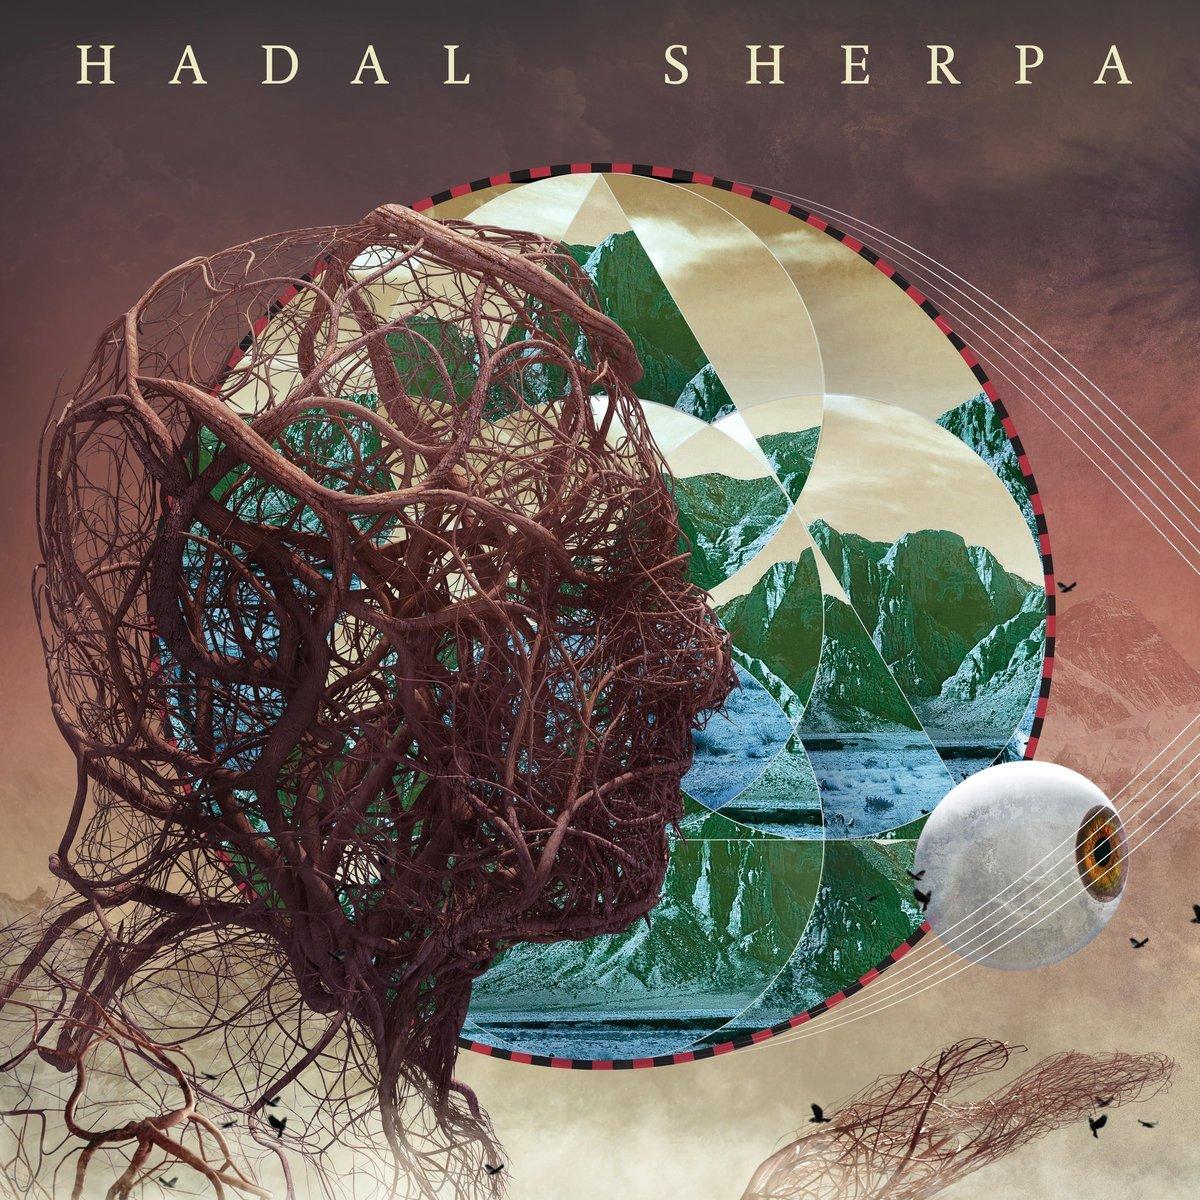 Hadal Sherpa — Hadal Sherpa